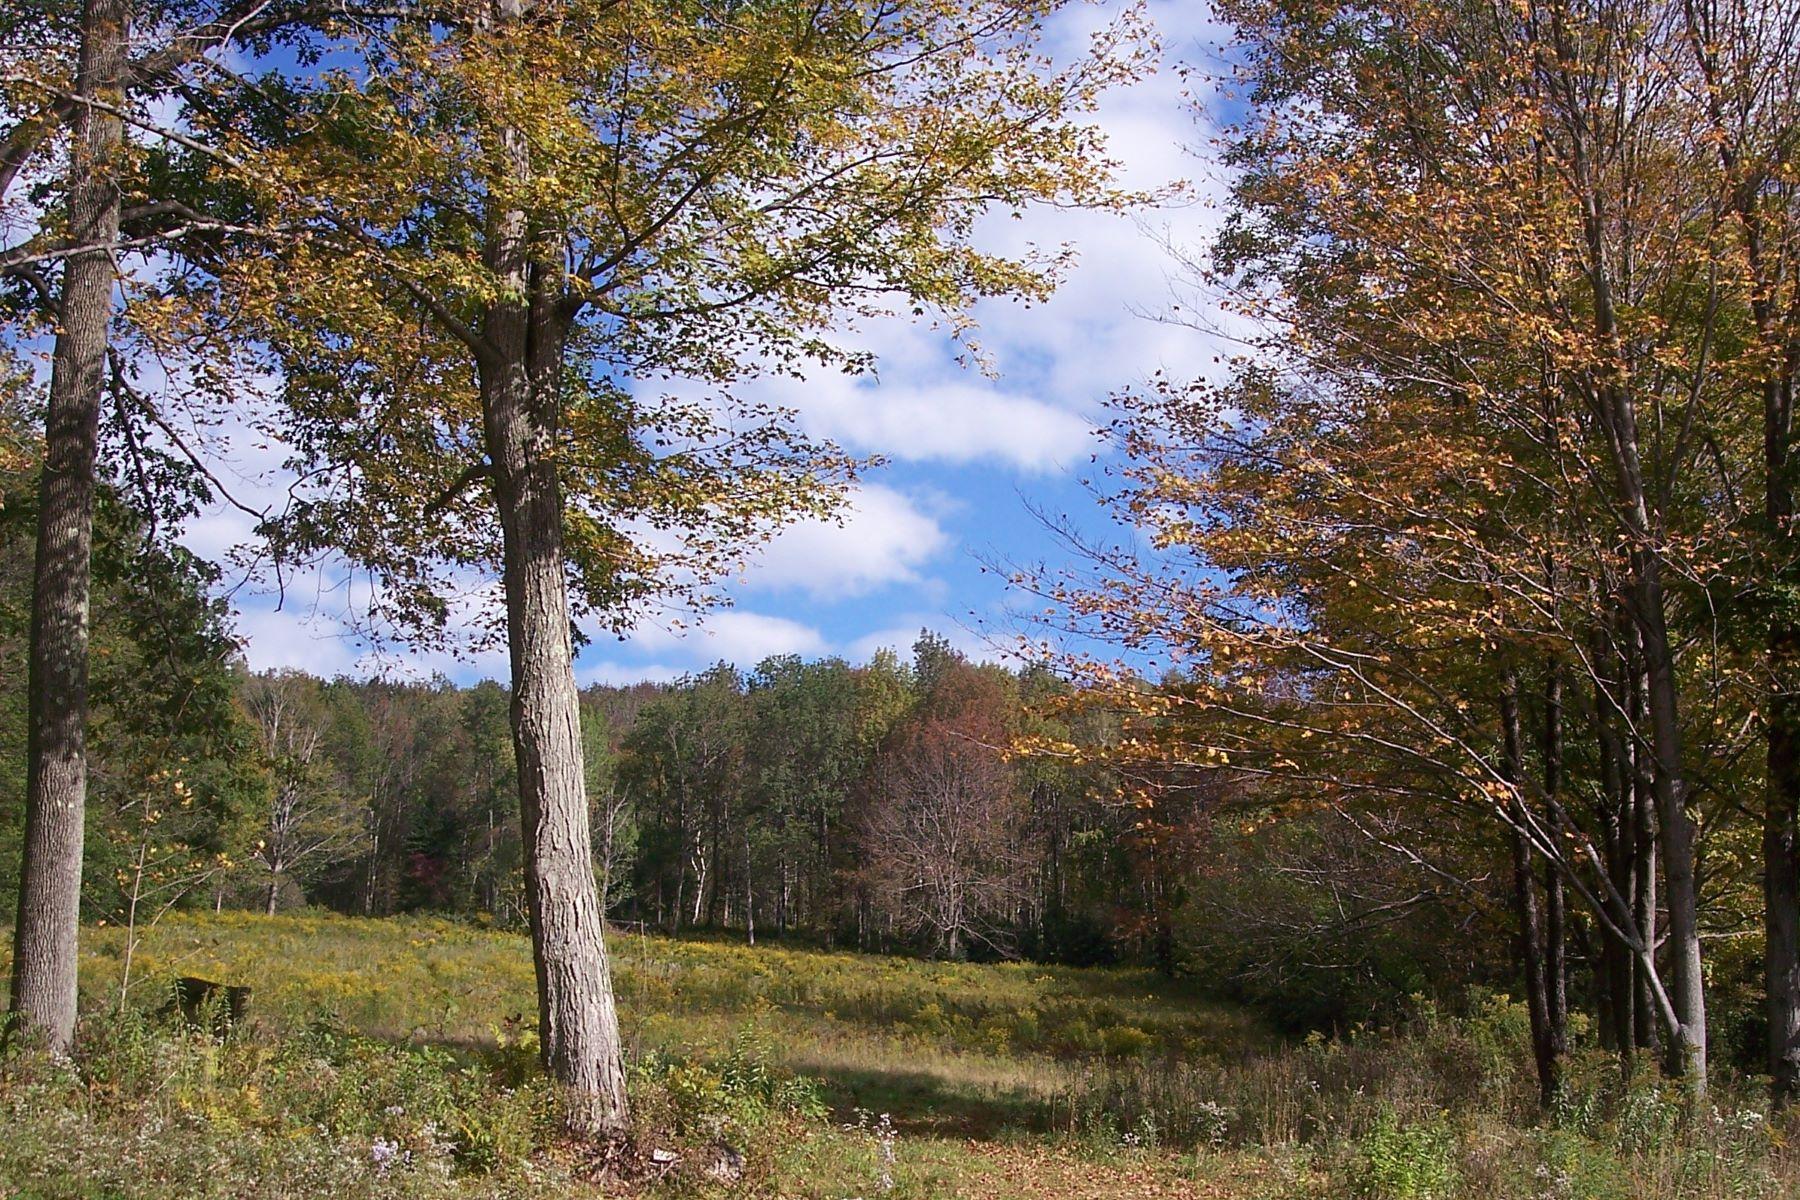 Land for Active at 10 Plus Acres Bordering 12,000 Plus Acres of State Lands Main St Lanesboro, Massachusetts 01237 United States